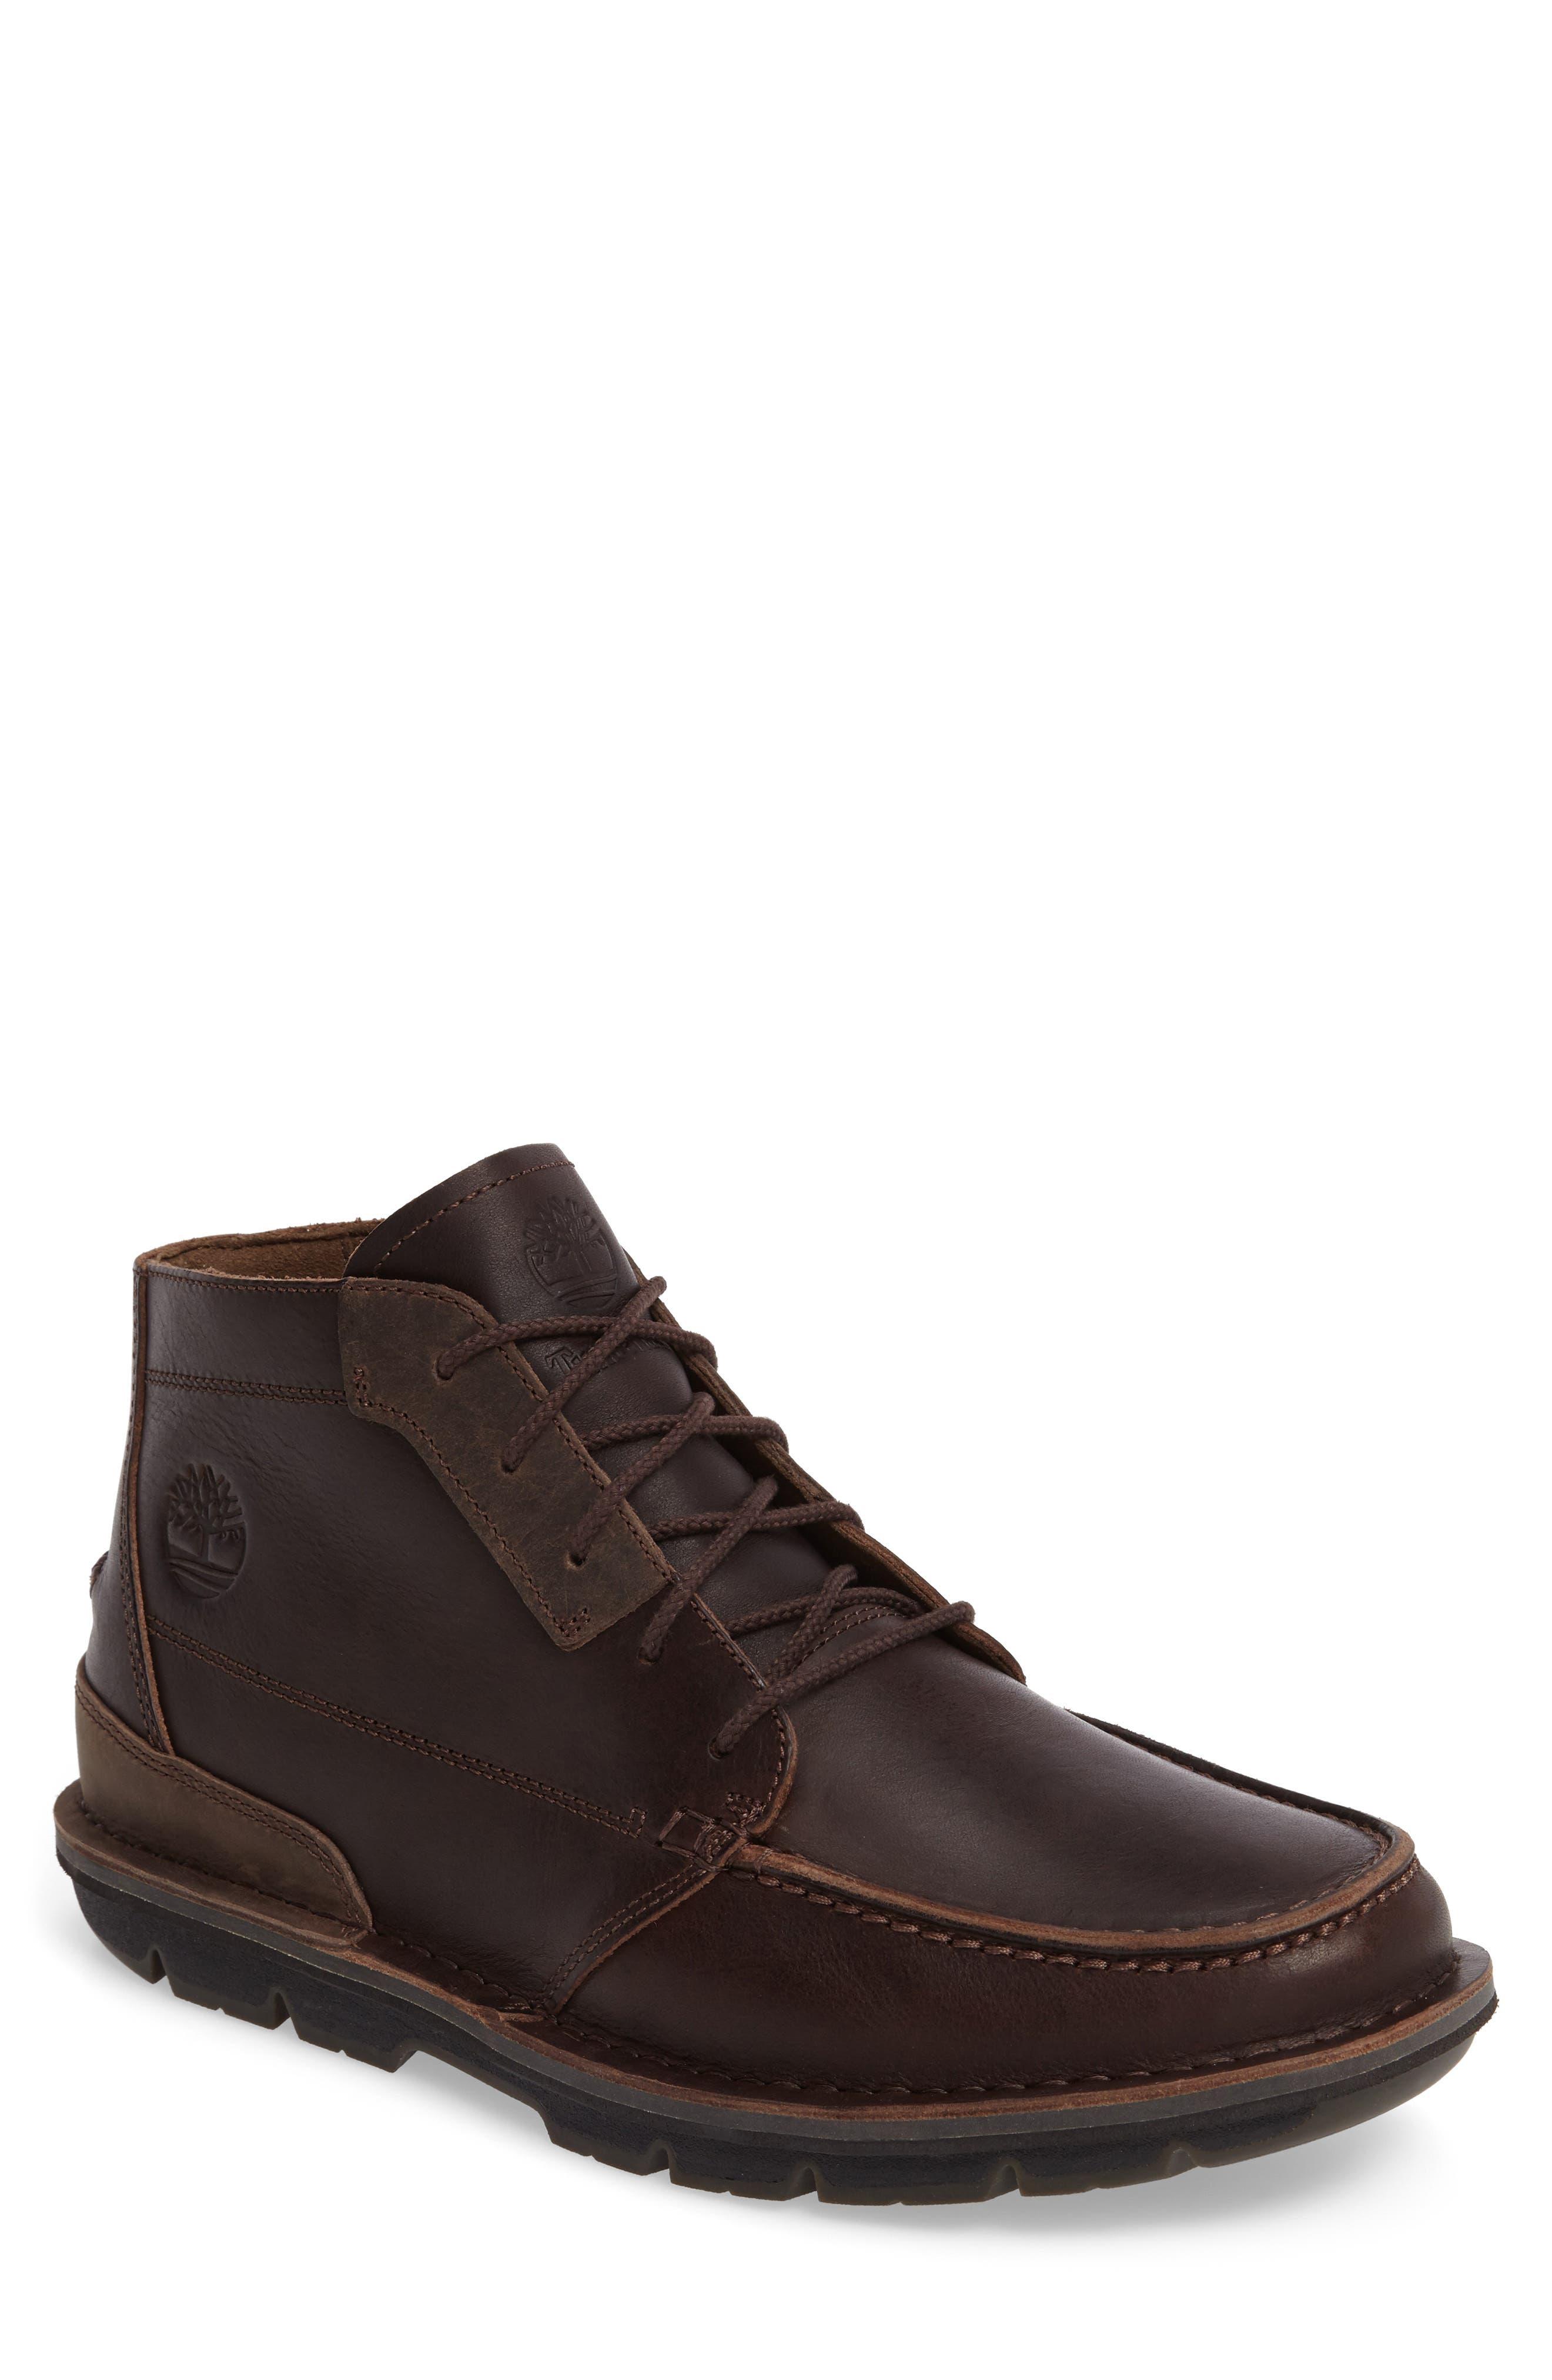 Timberland Coltin Moc Toe Boot (Men)